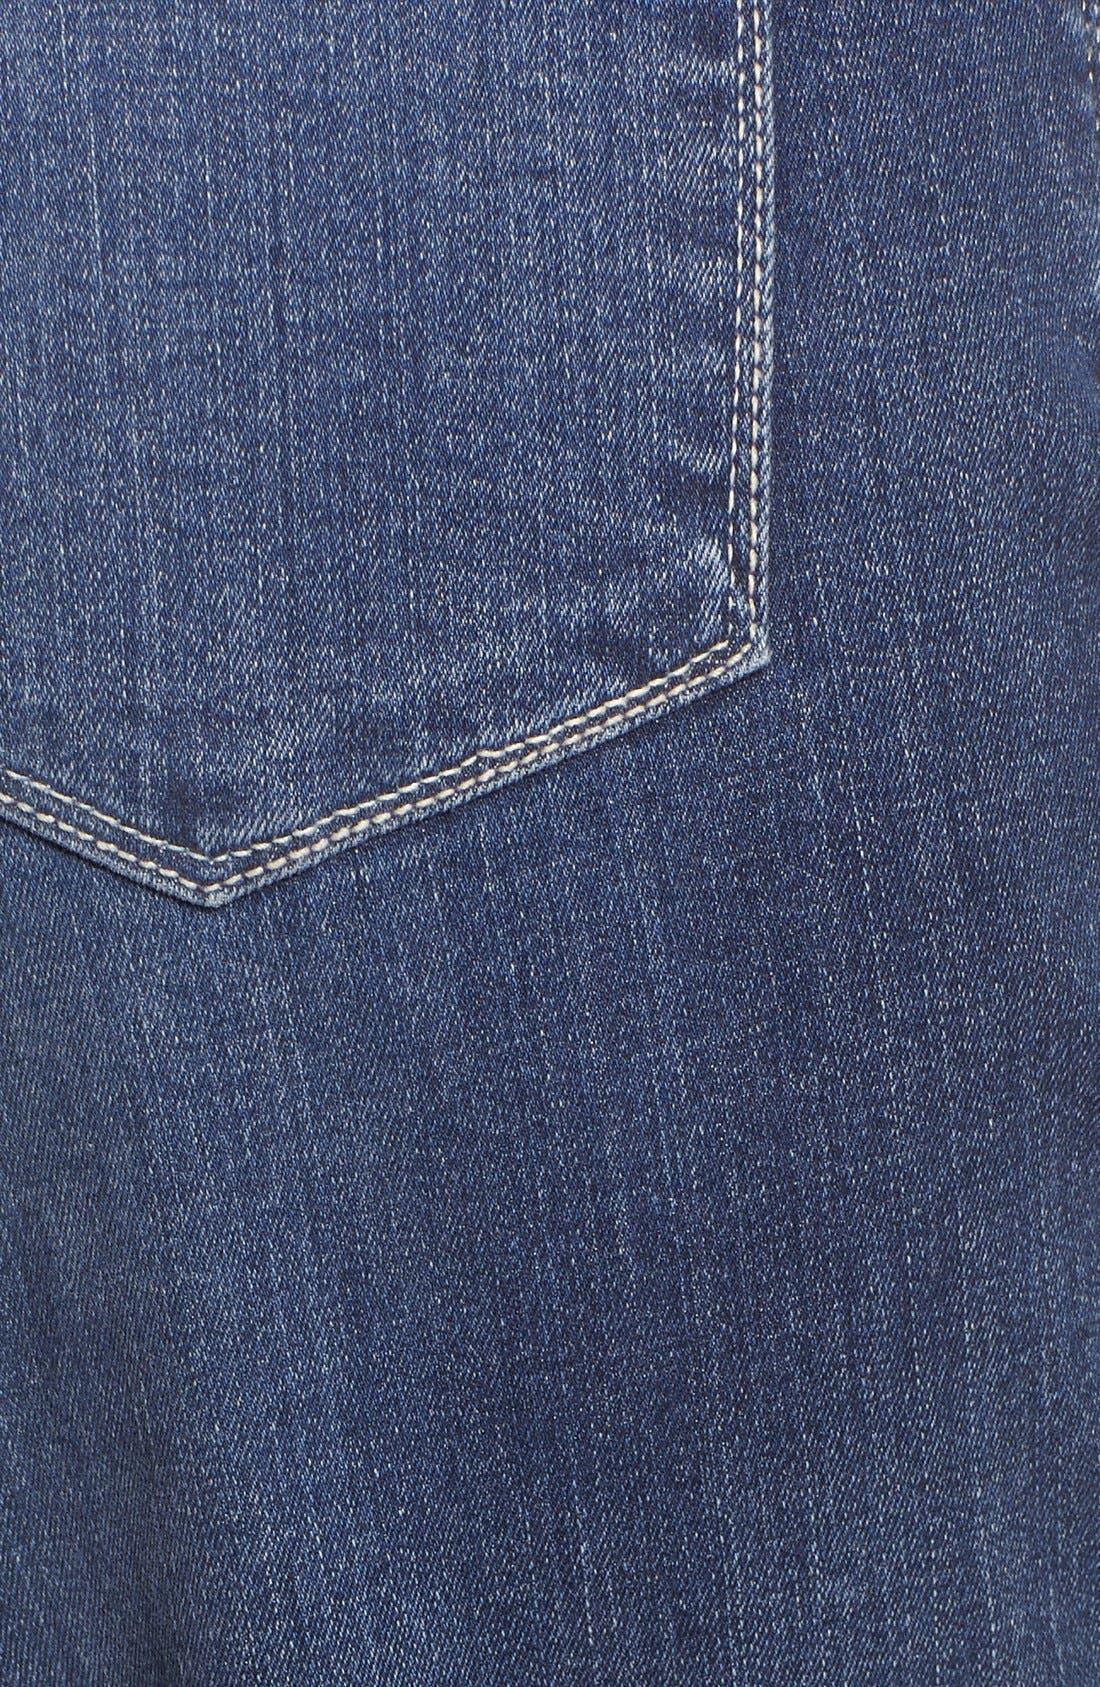 'Dayla' Colored Wide Cuff Capri Jeans,                             Alternate thumbnail 78, color,